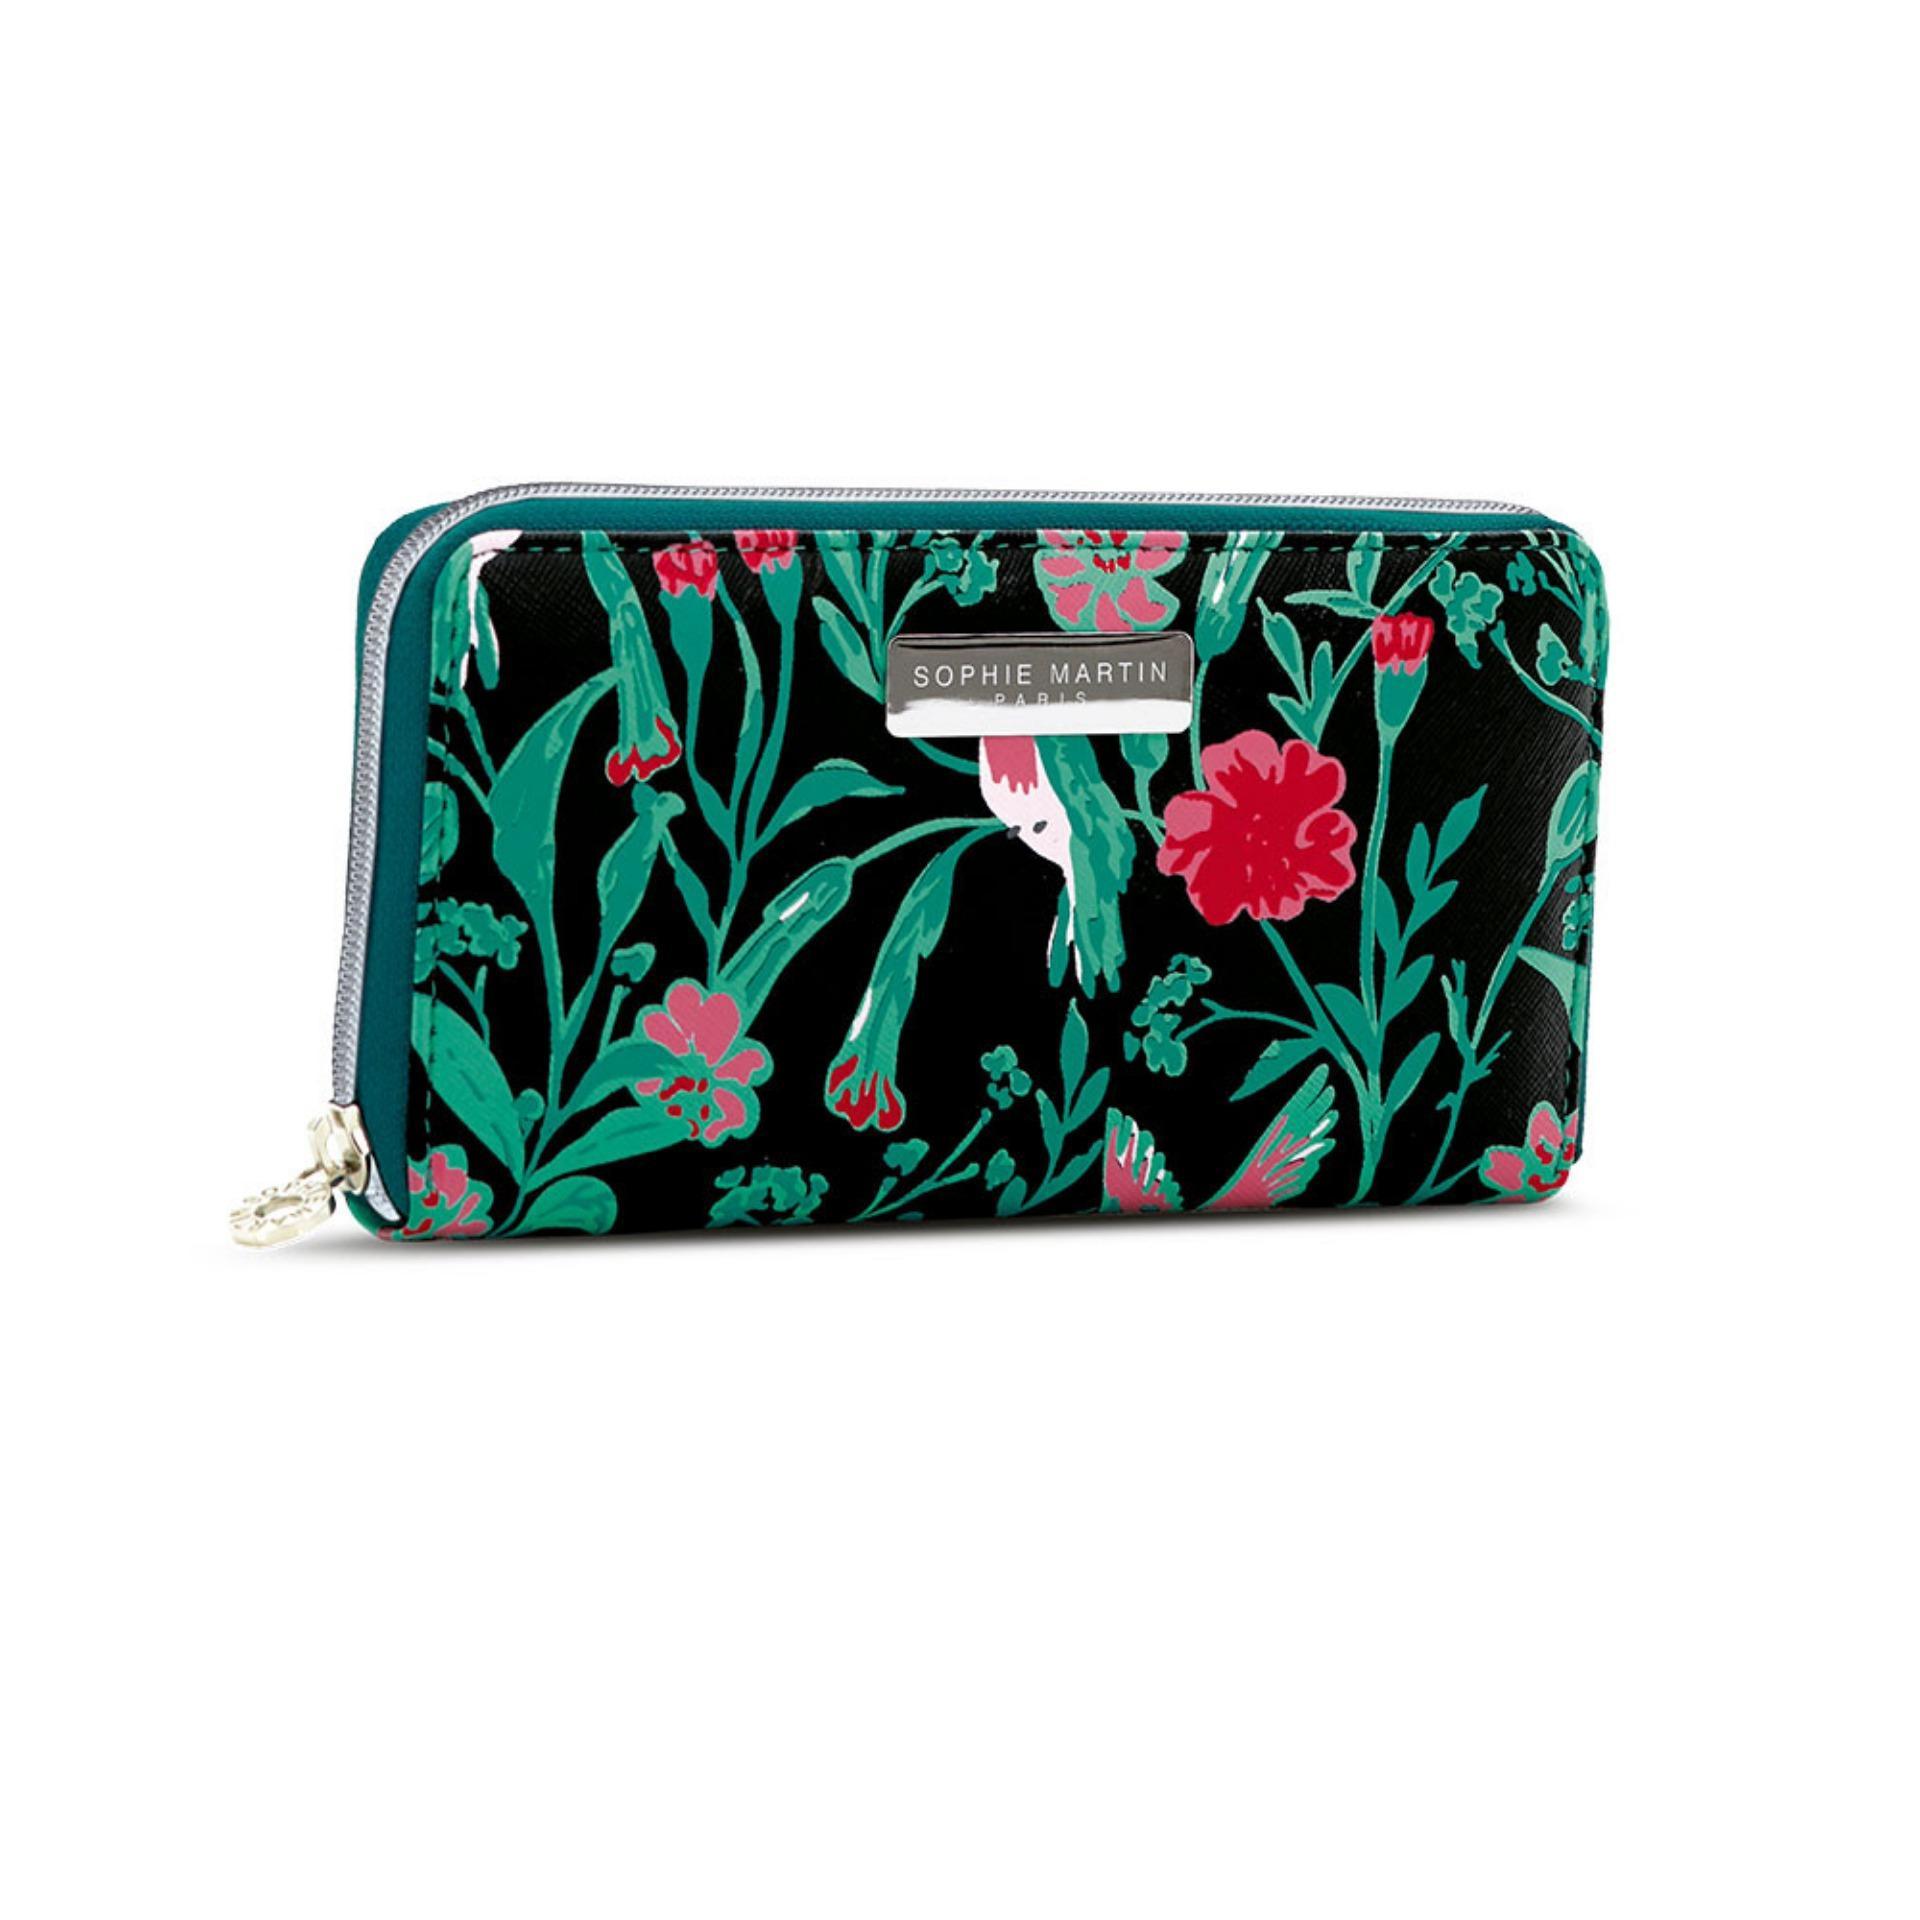 ... Sophie Paris Dompet Branded Wanita Terbaru Arthemis Wallet W1418M4 -  Multiwarna - 4 ... 64c96a7310